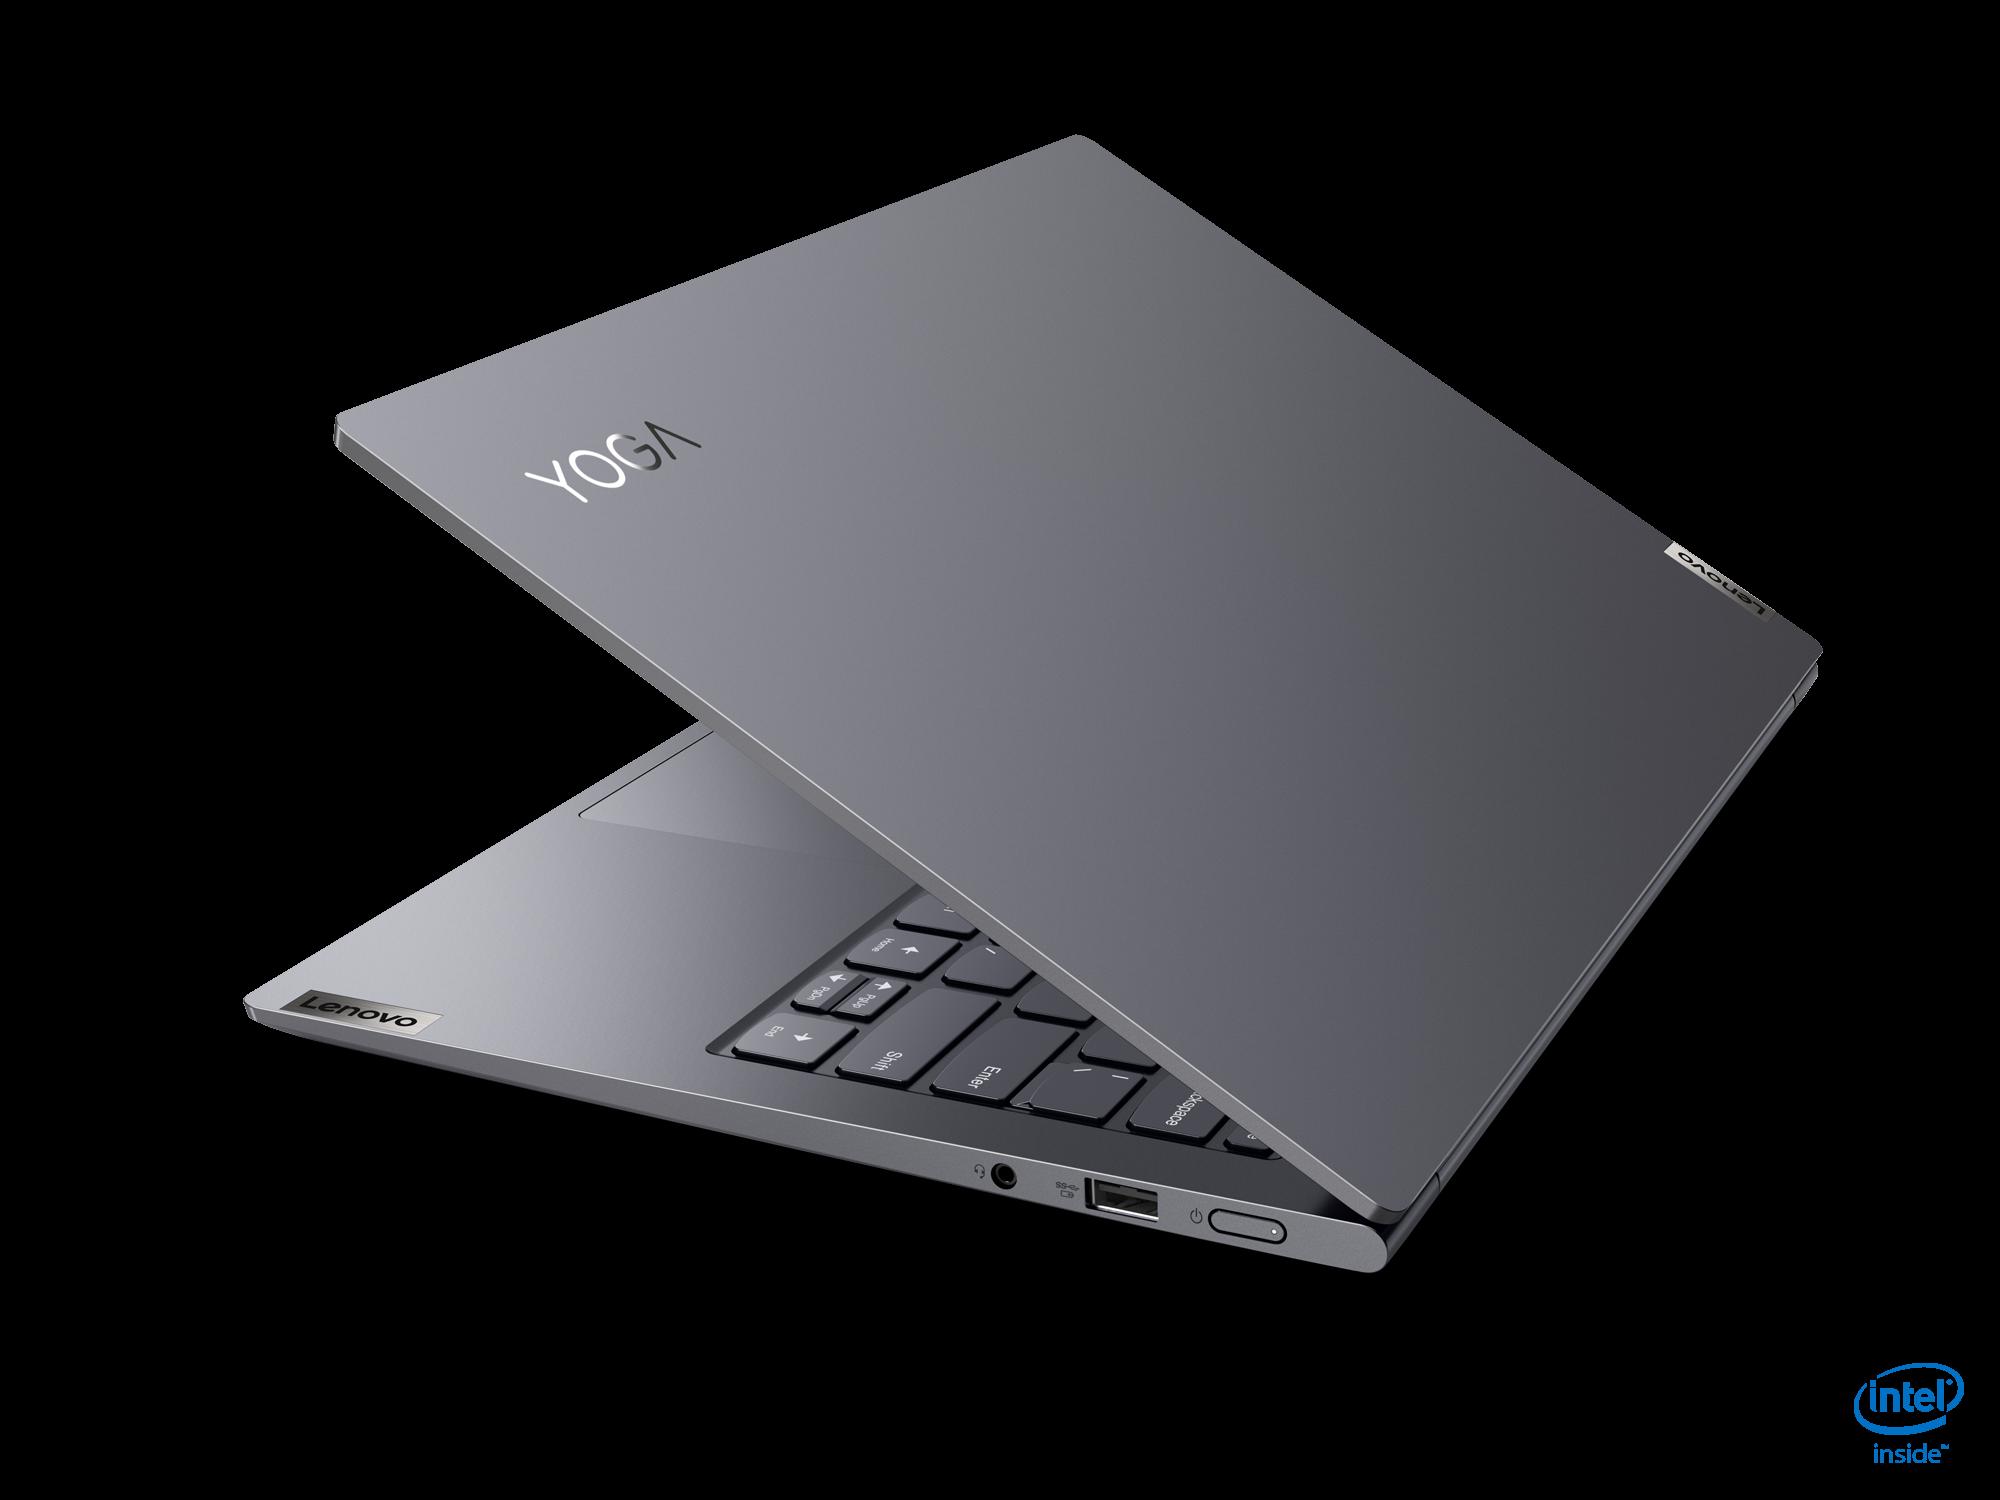 lenovo-yoga-slim-7i-pro-now-comes-with-90hz-oled-and-nvidia-mx450-gpu